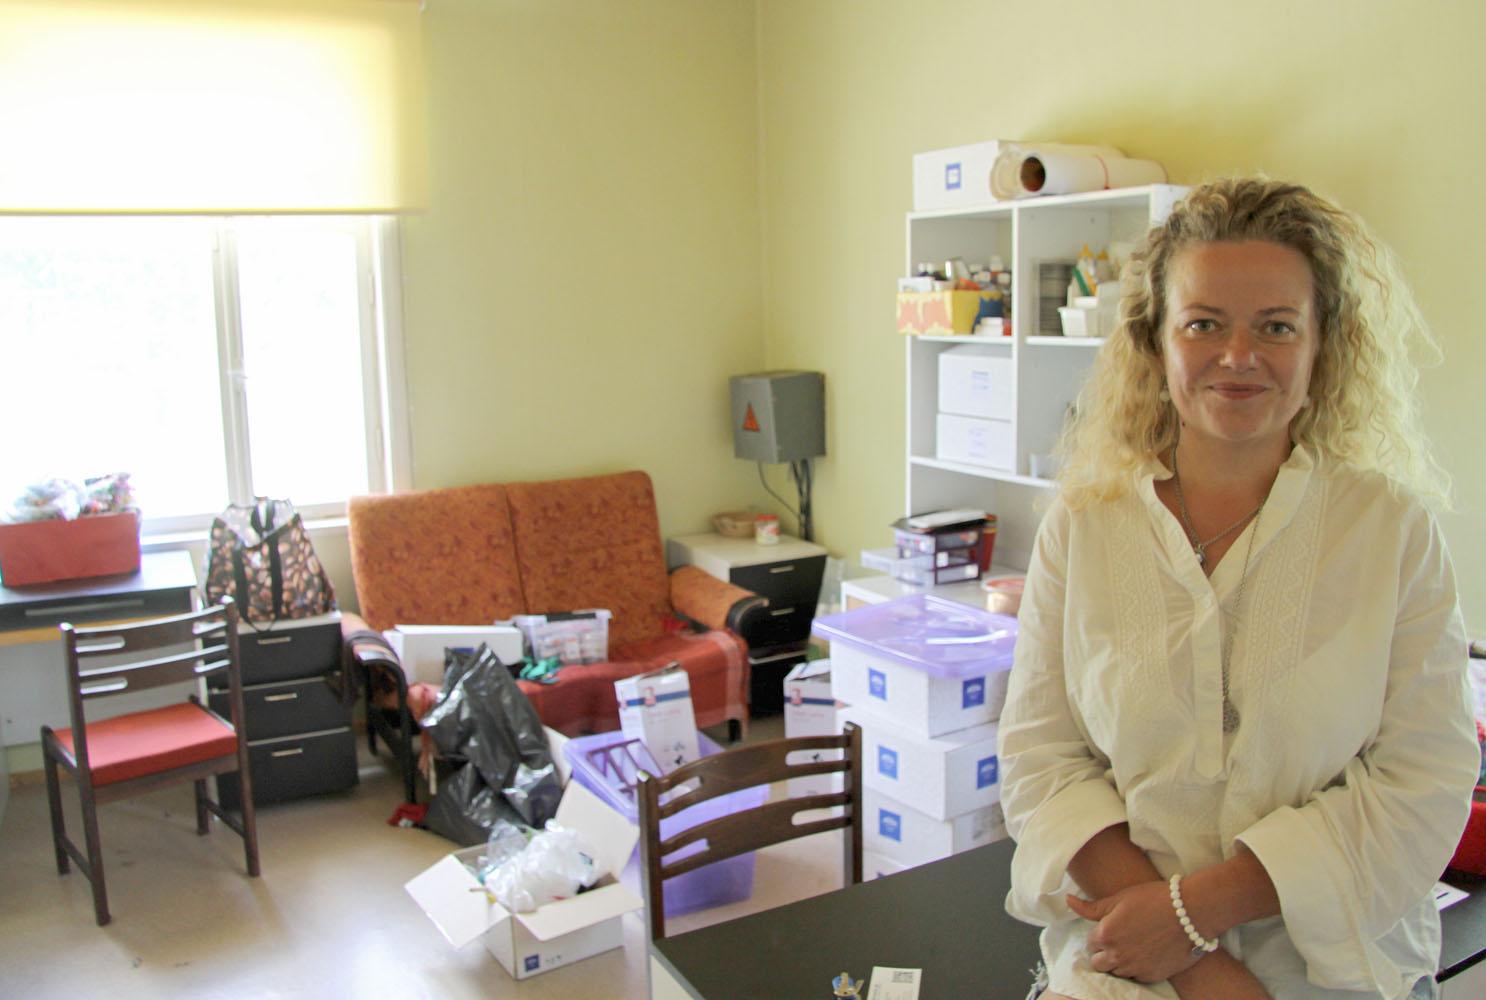 Sozialarbeiterin Merilin Niilop (39) hat große Pläne mit Katikodu.